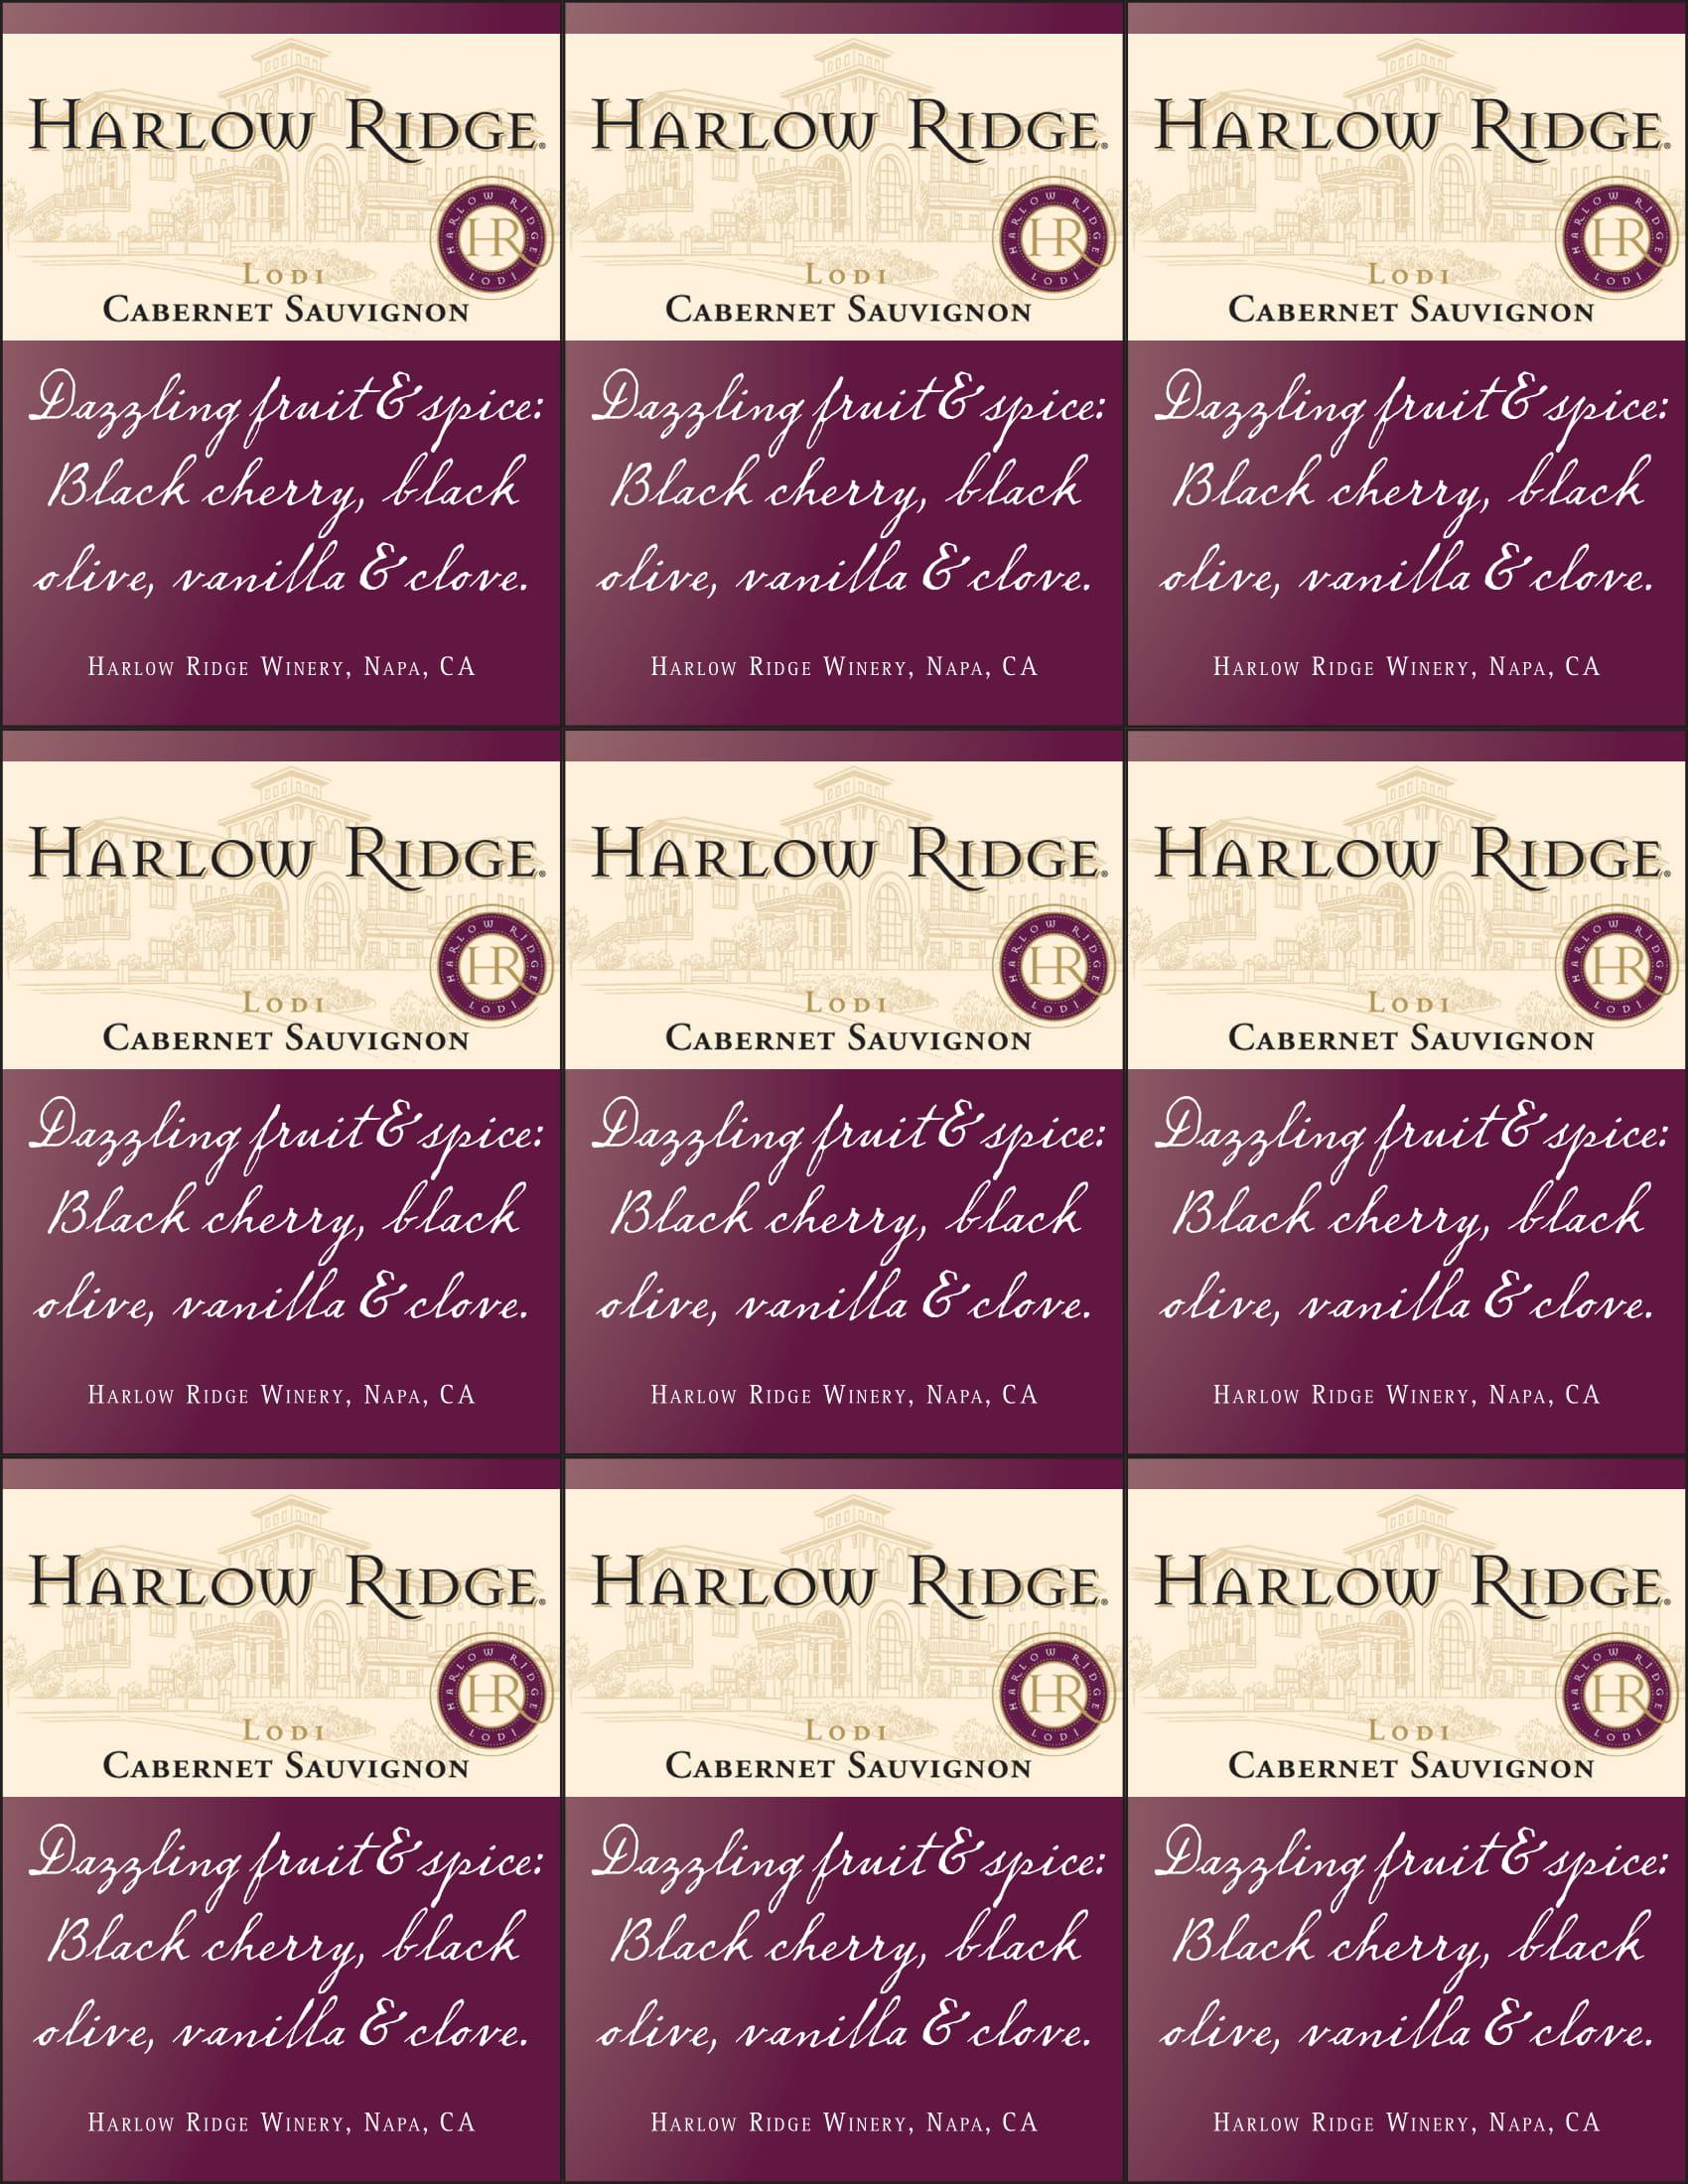 Harlow Ridge Cabernet Sauvignon Shelf Talker